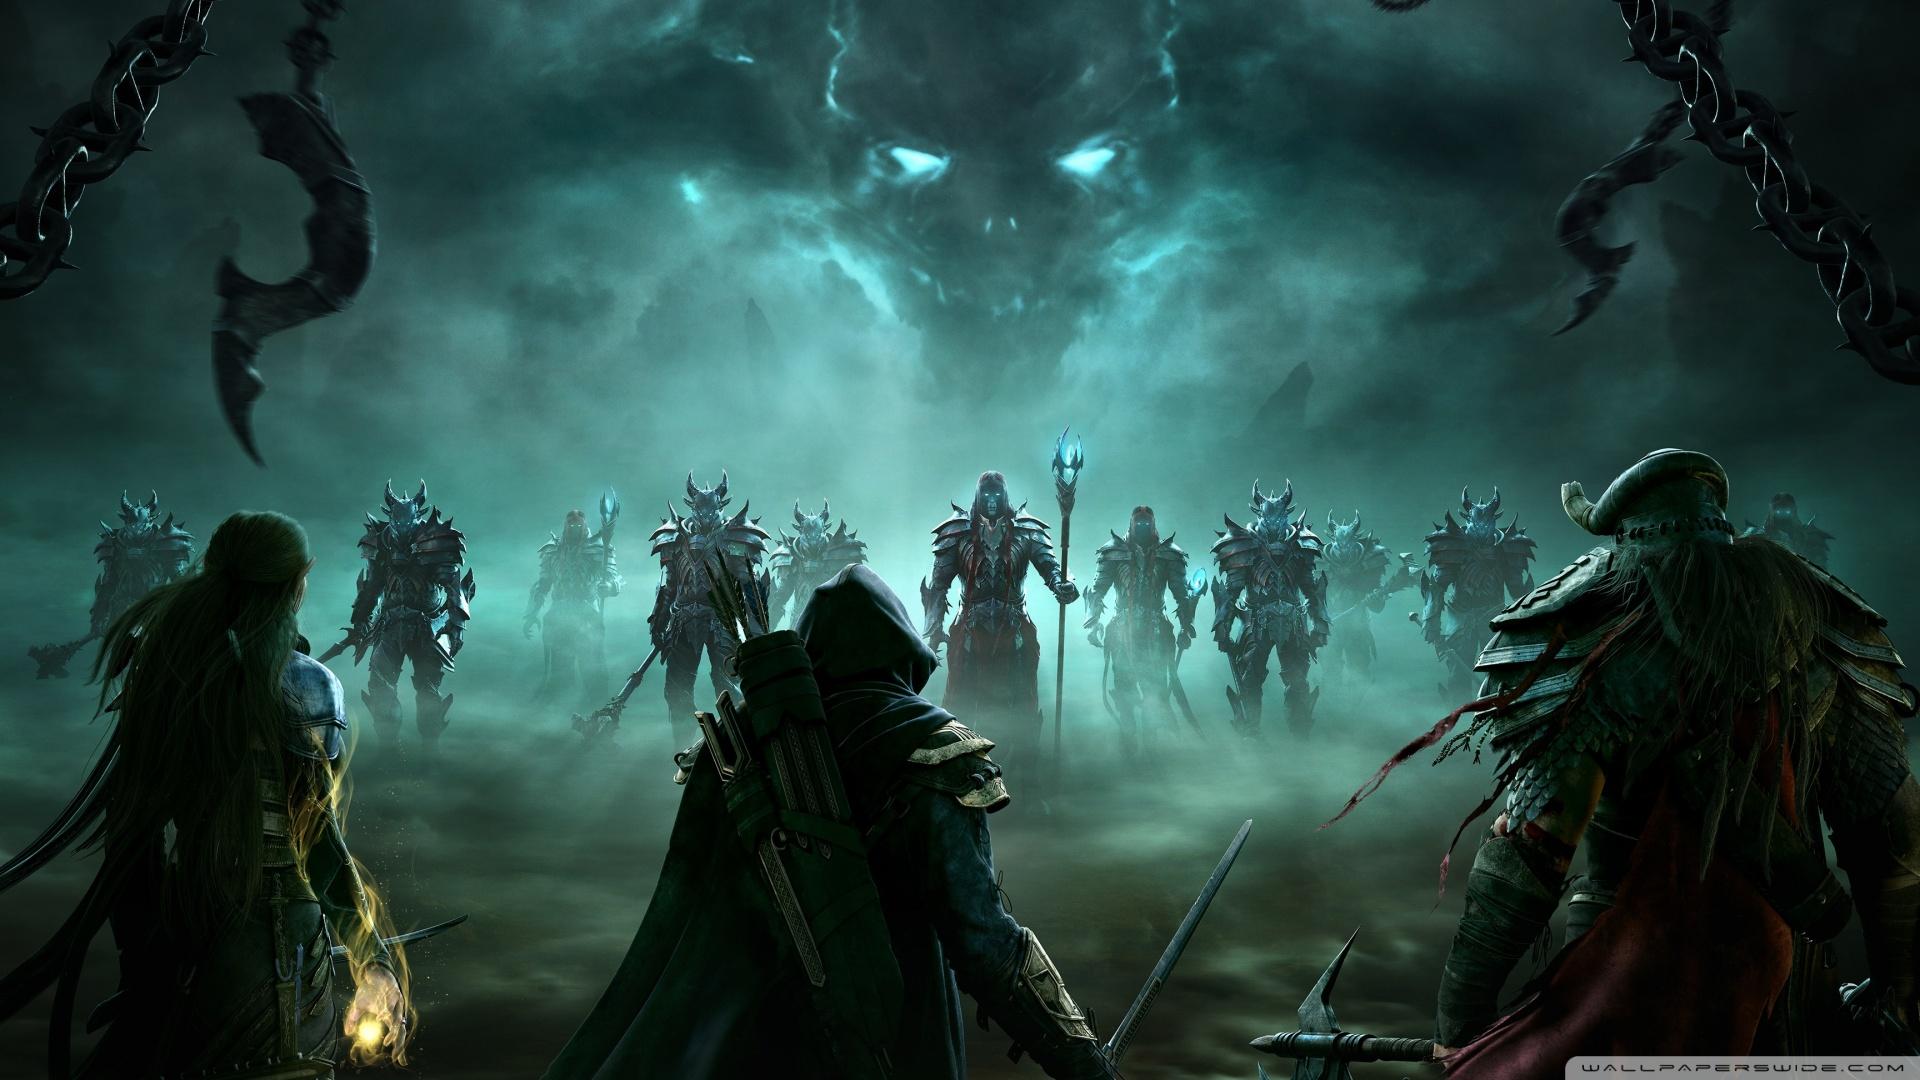 the_elder_scrolls_online_battlefield-wallpaper-1920x1080